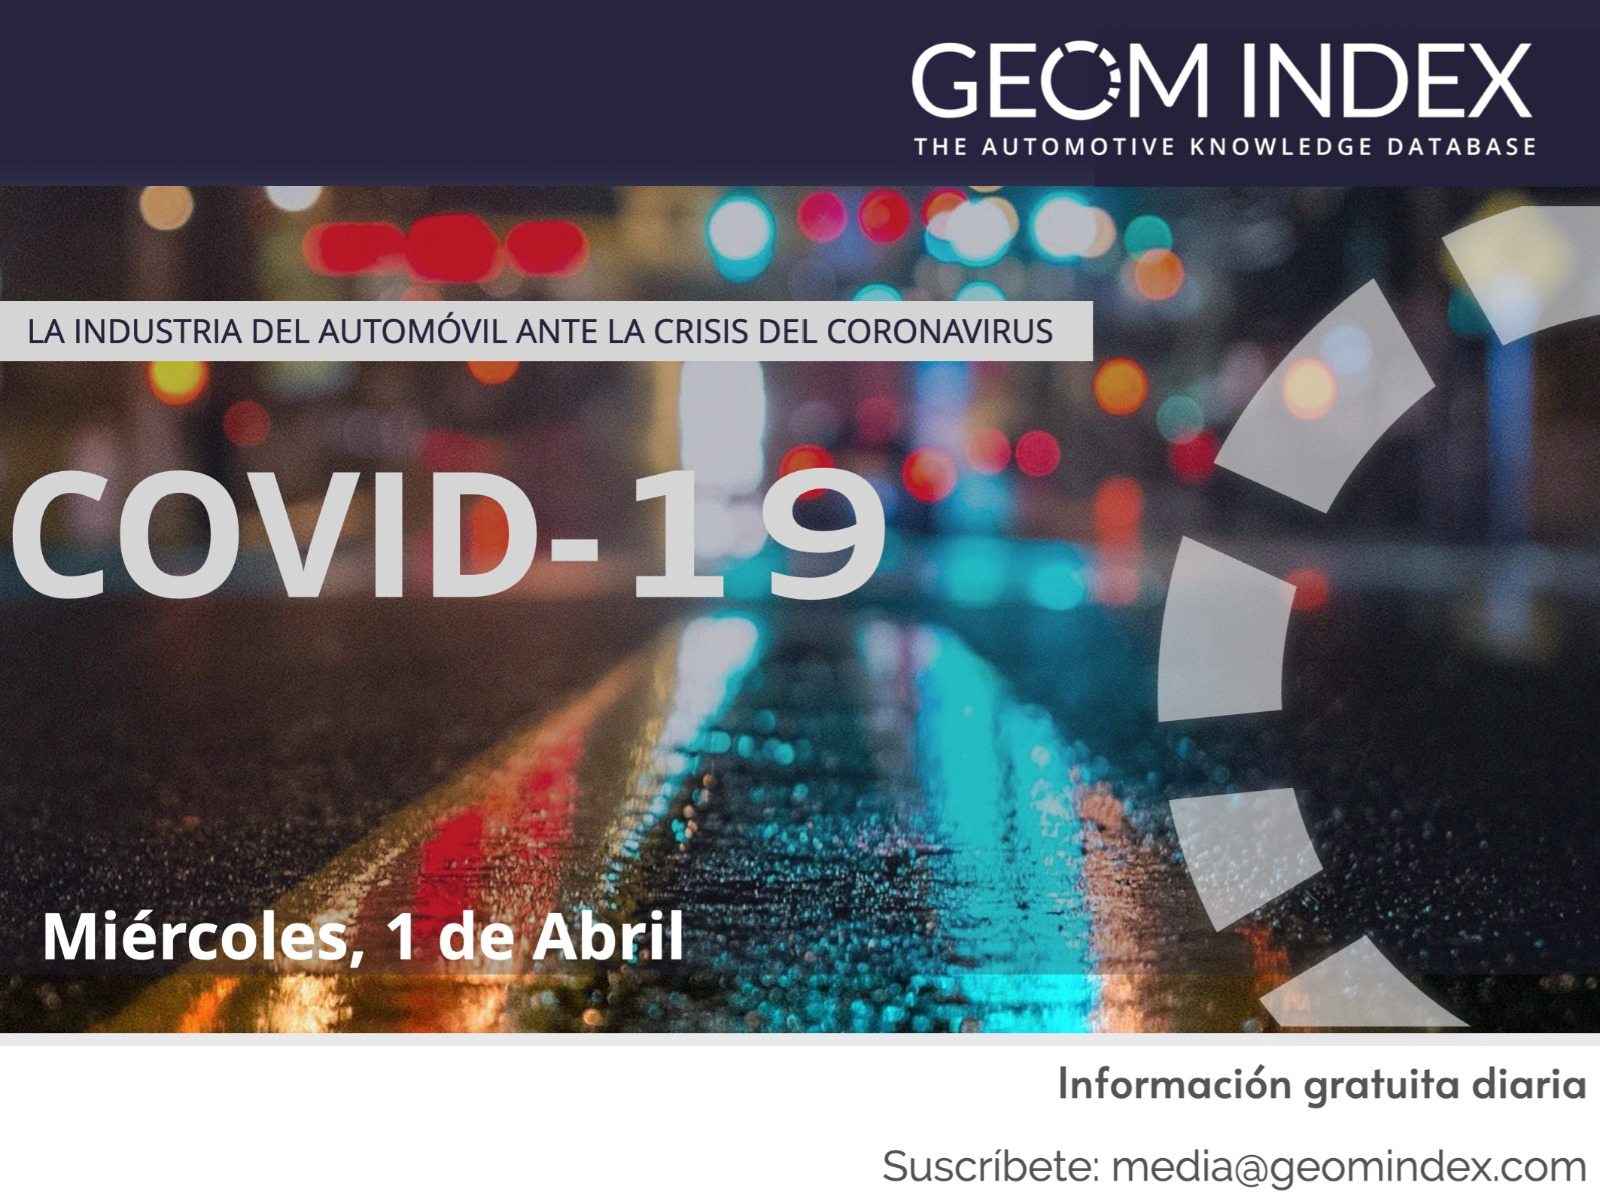 Informe 1/04/2020 – La industria del automóvil ante la crisis del Covid-19